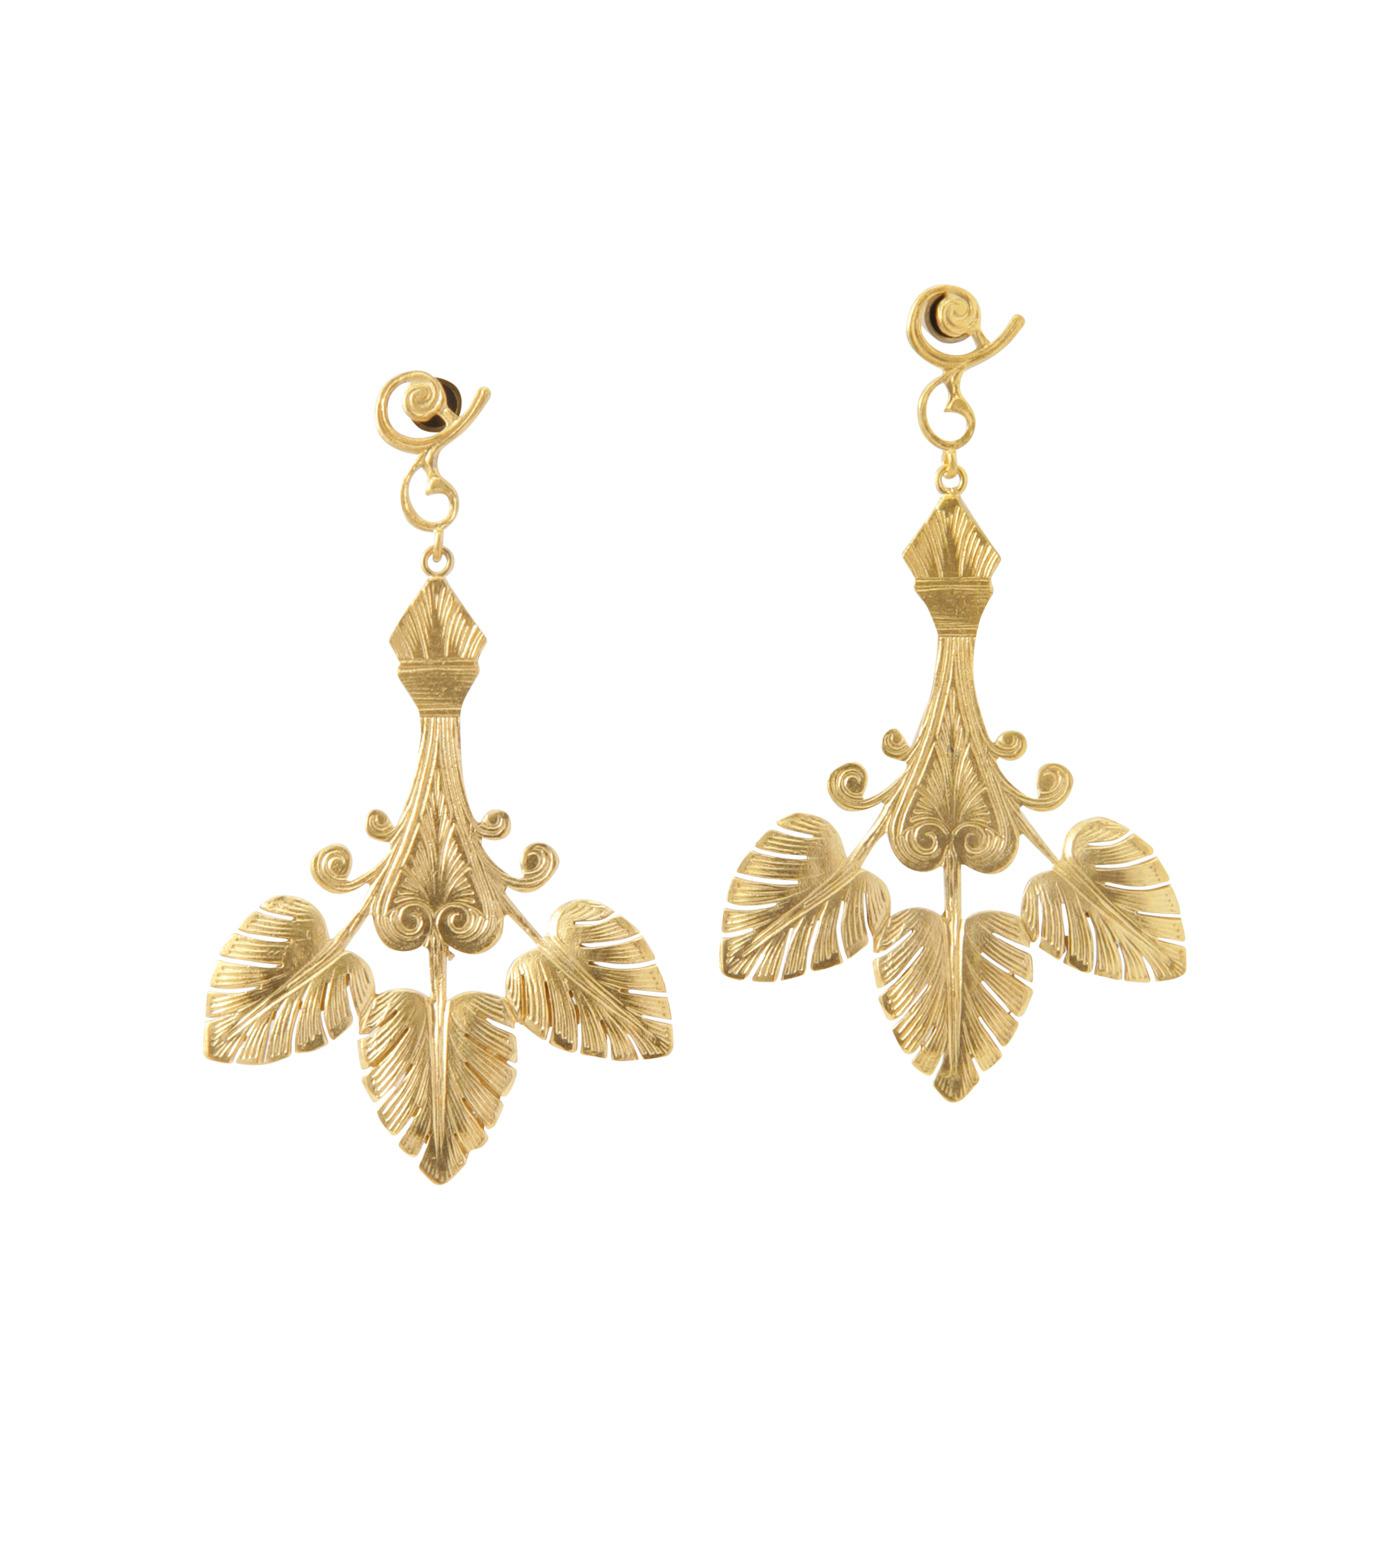 I AM by Ileana Makri(アイ アム バイ イリーナ マクリ)のTriple Golden Leaf Earrings-GOLD-O523-42-099-2 拡大詳細画像1